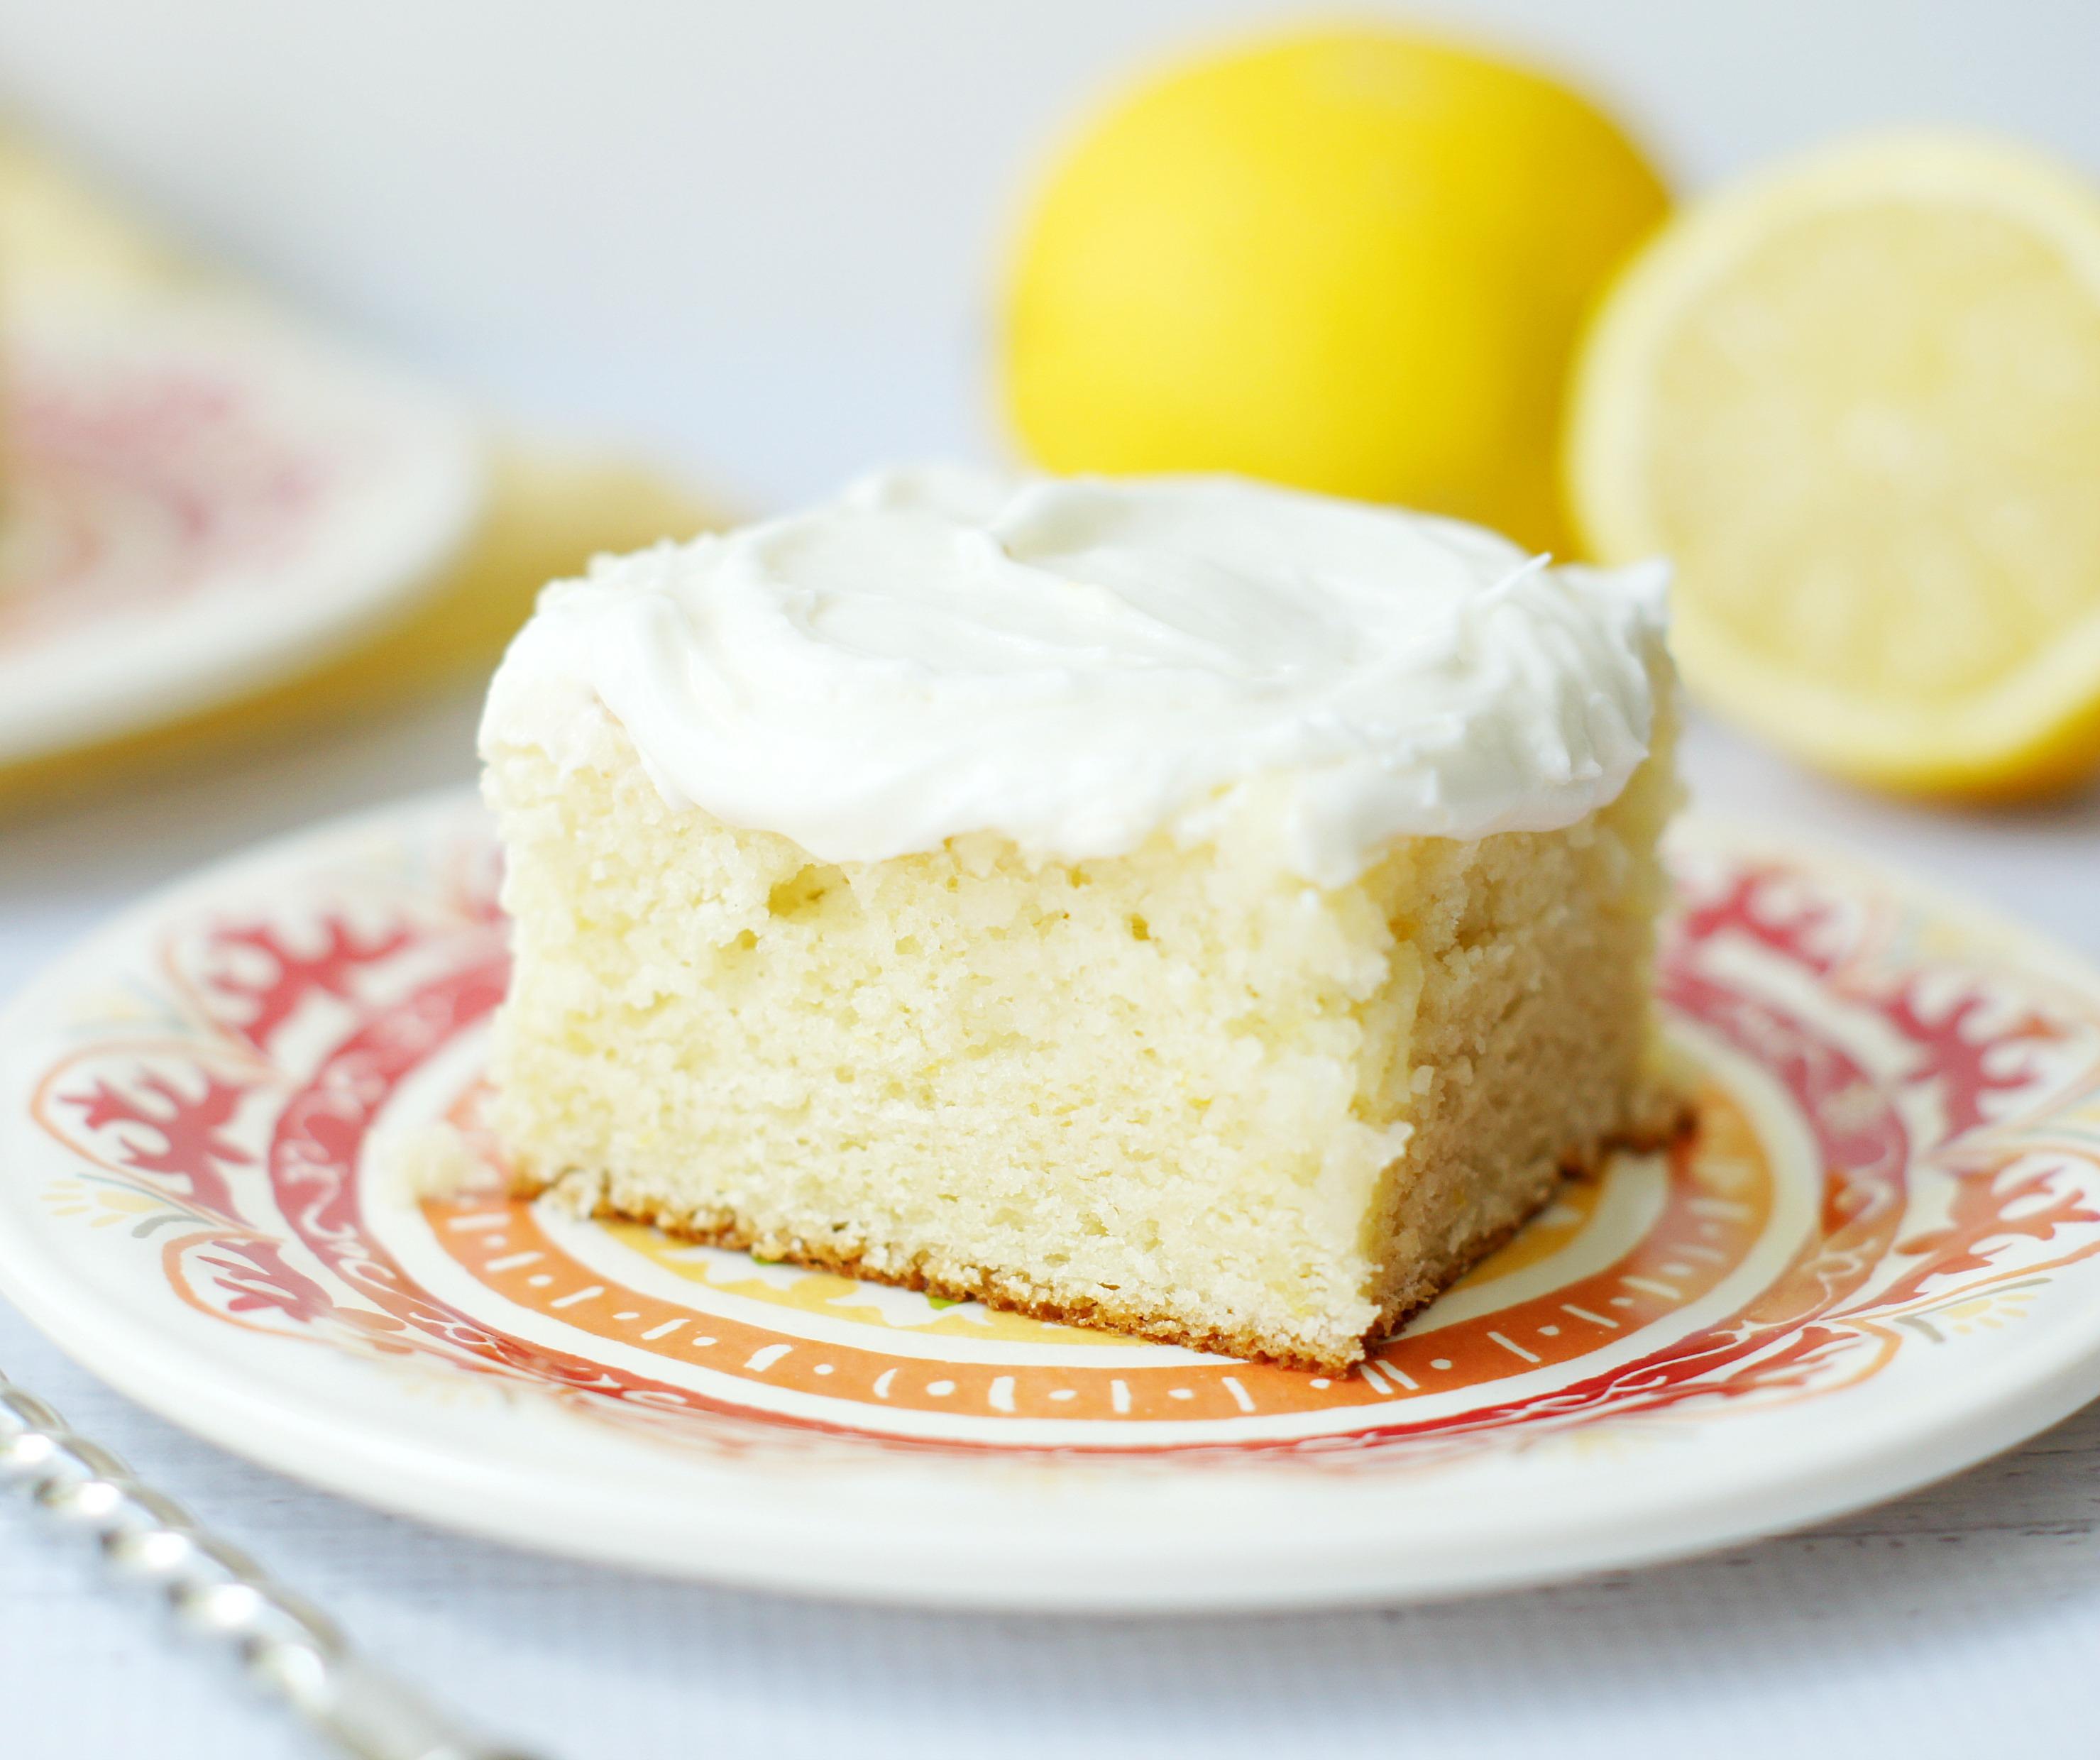 Lemon Cakes Recipes: Lemon Cake With Sour Cream Lemon Icing